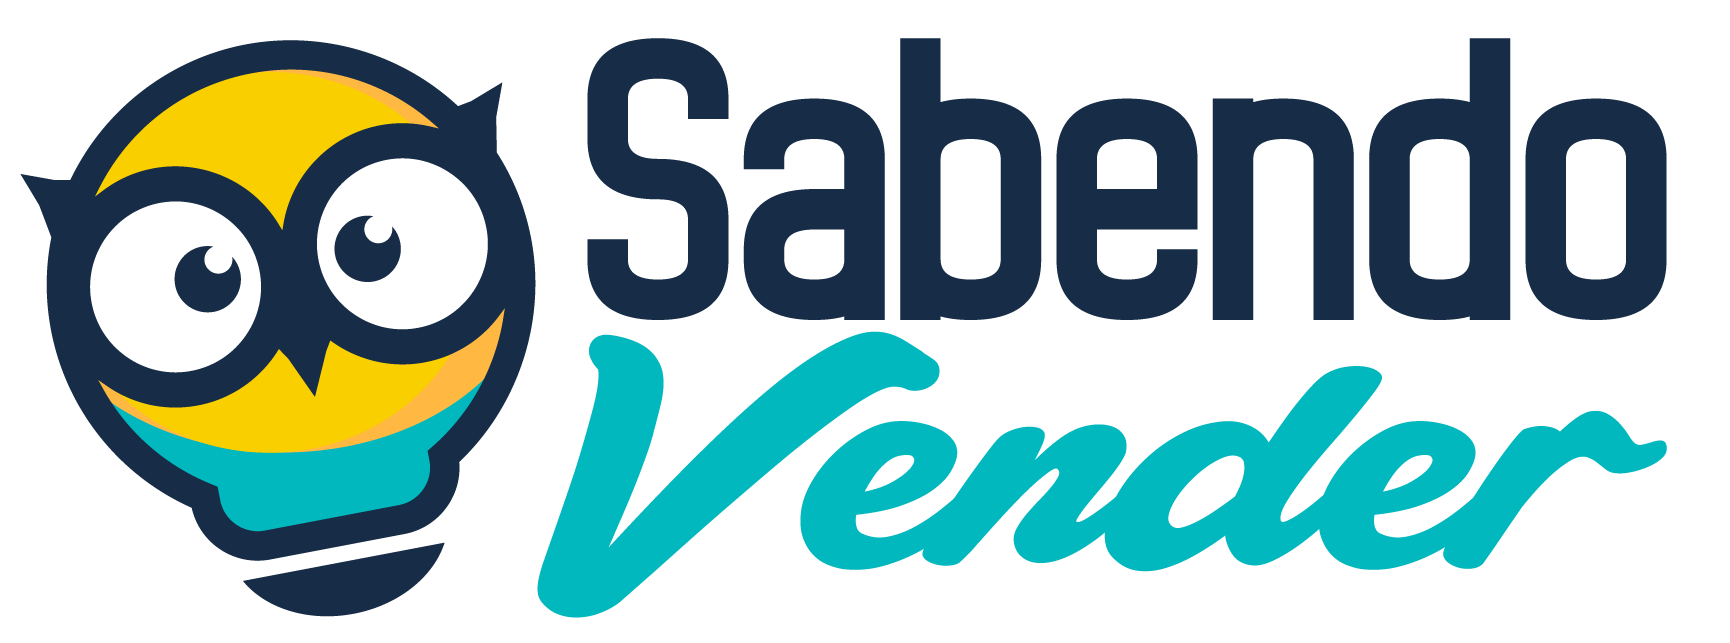 Página Inicial | →Sabendo Vender | Marketing Digital, Empreendedorismo & Negócio Online